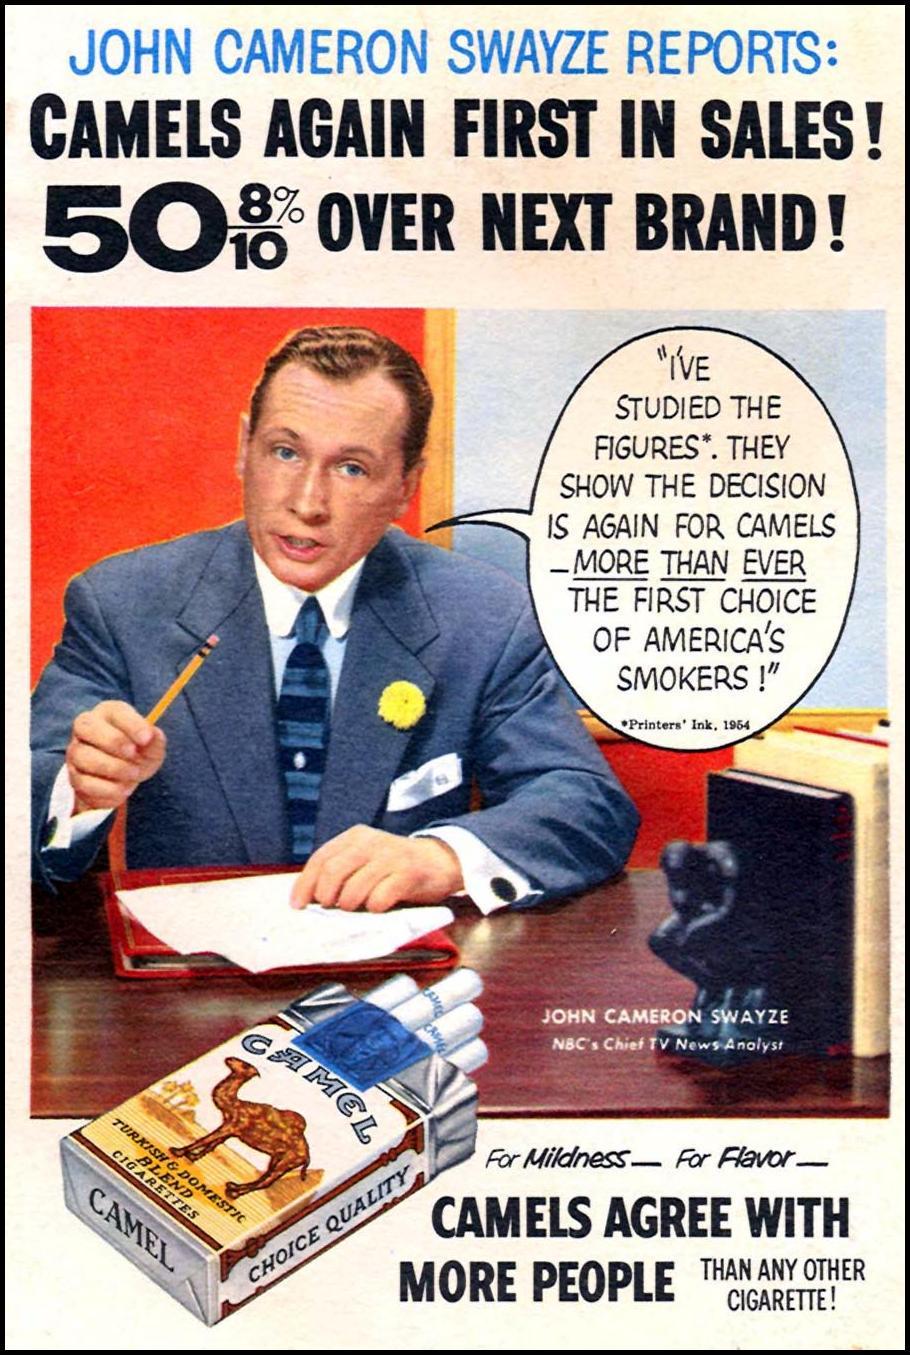 CAMEL CIGARETTES CORONET 07/01/1954 BACK COVER